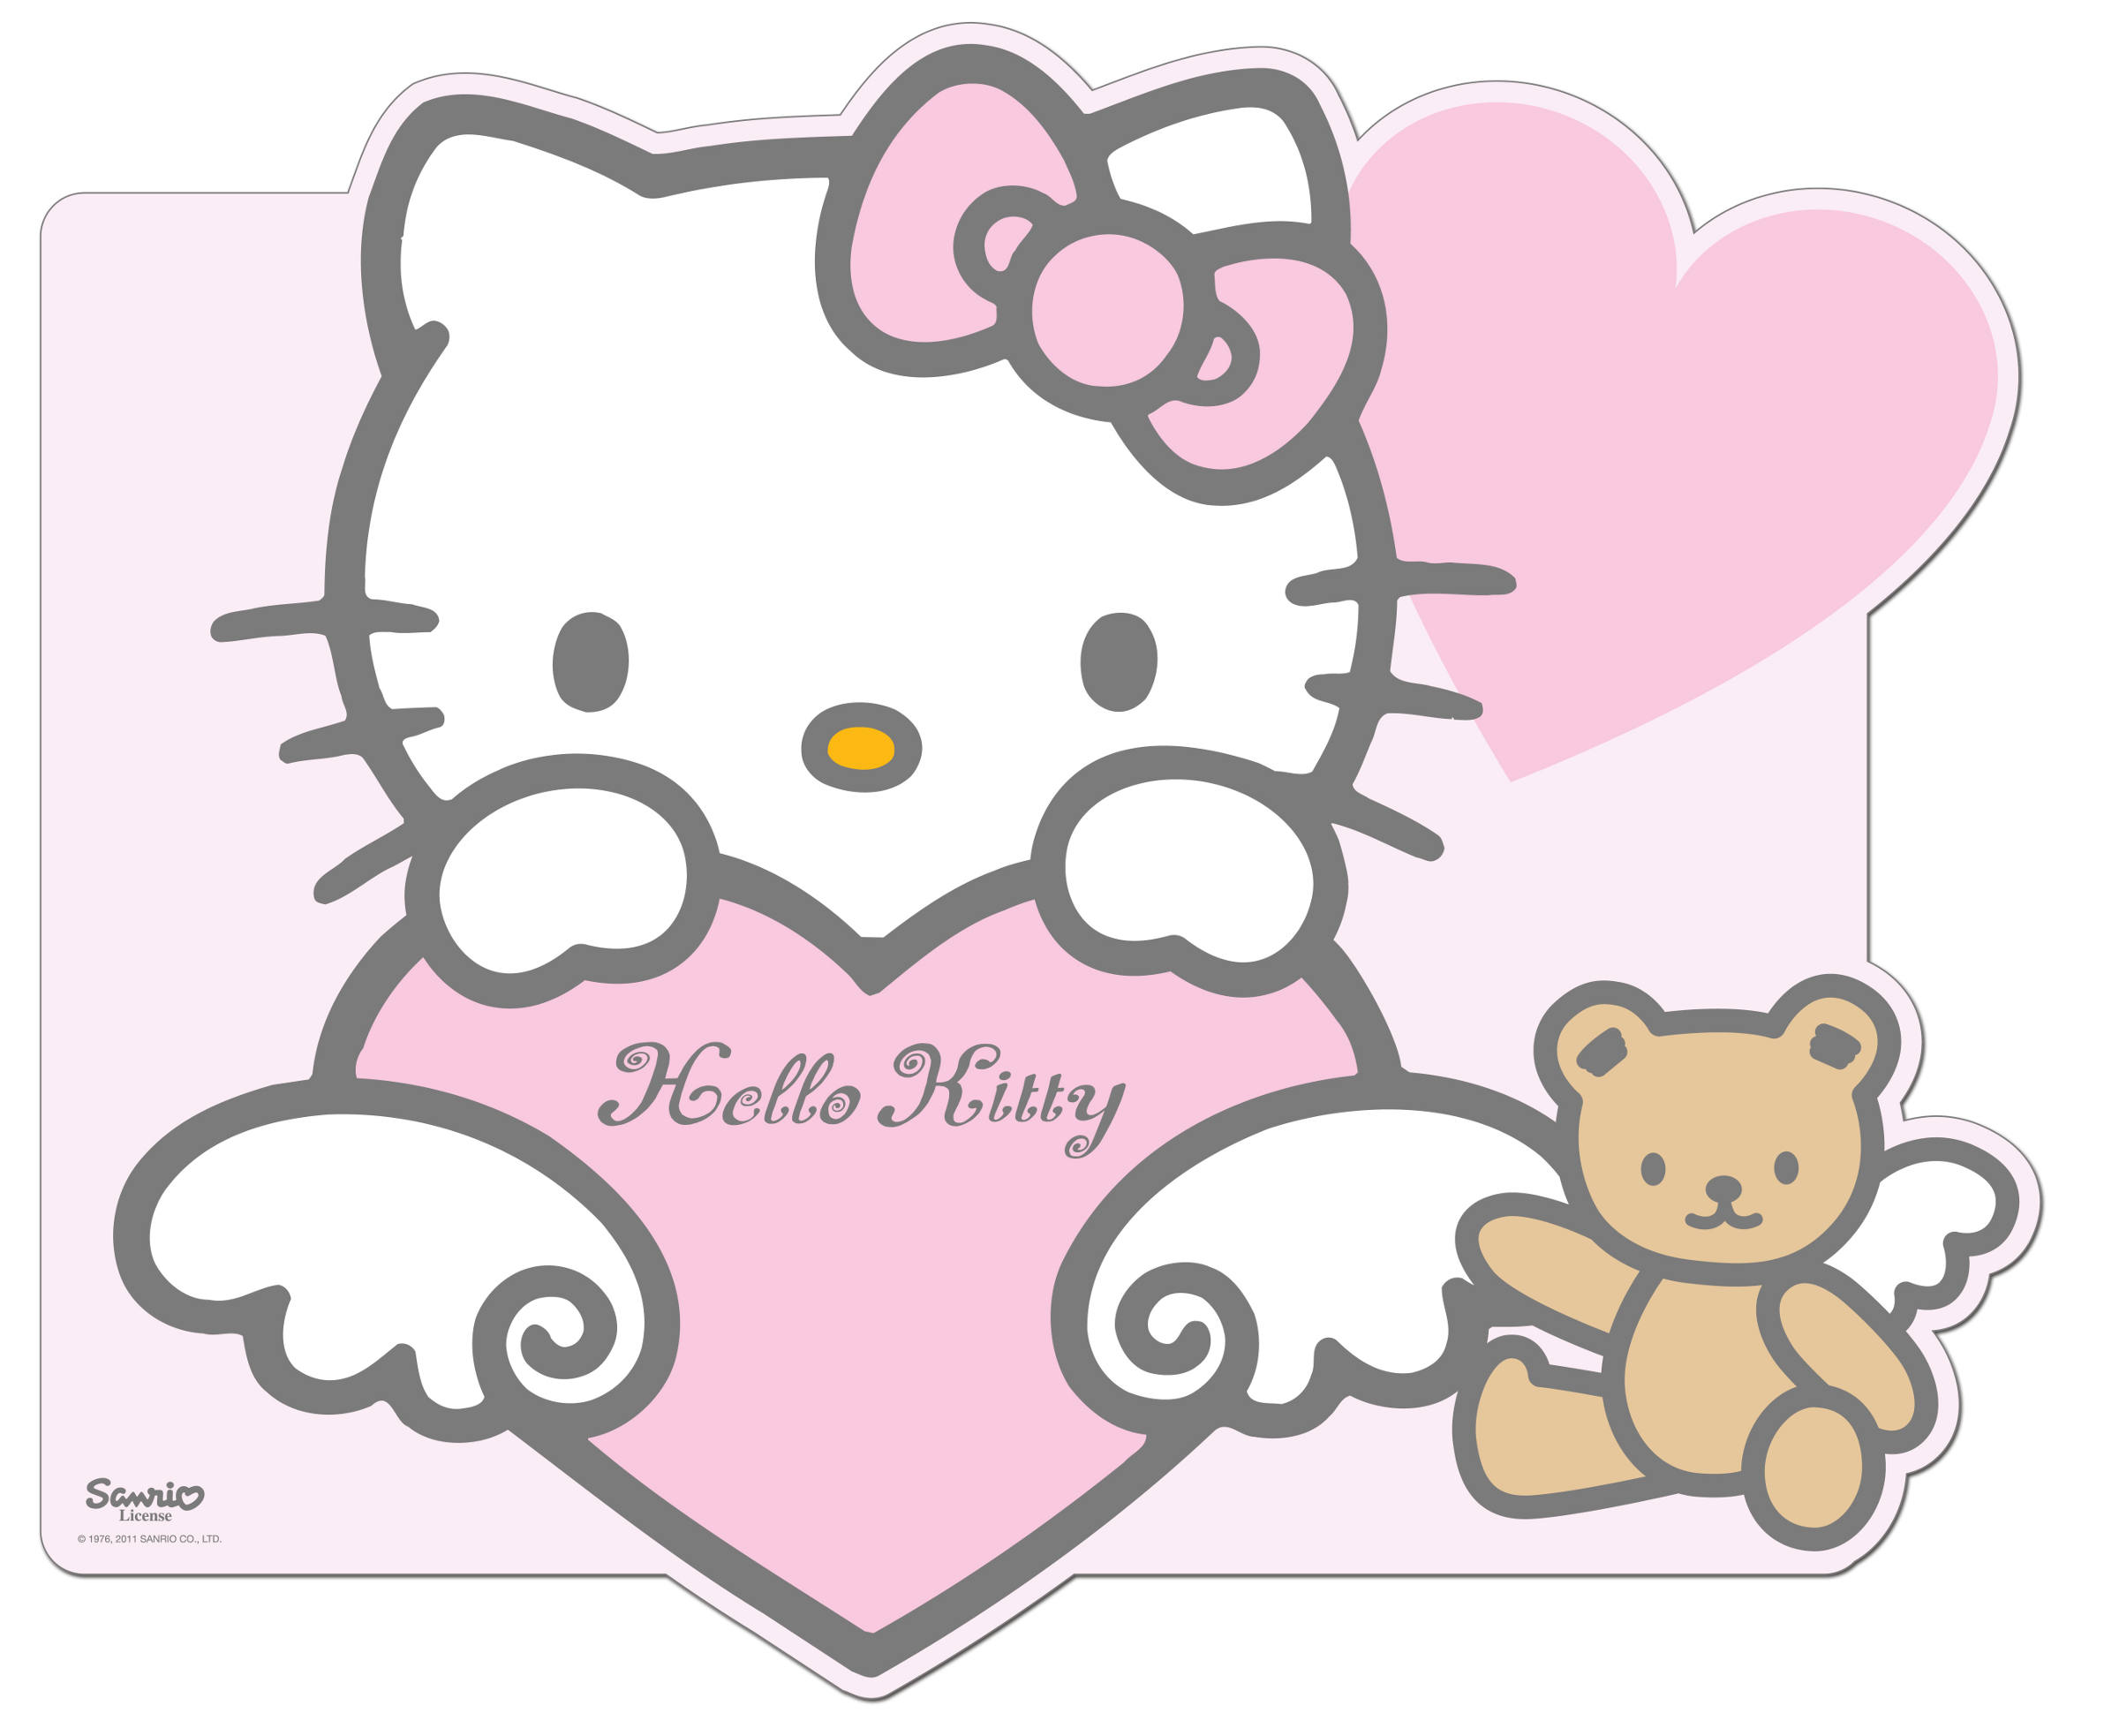 Set de table hello kitty baby d coration anniversaire et f tes th me sur vegaoo party - Table de nuit hello kitty ...